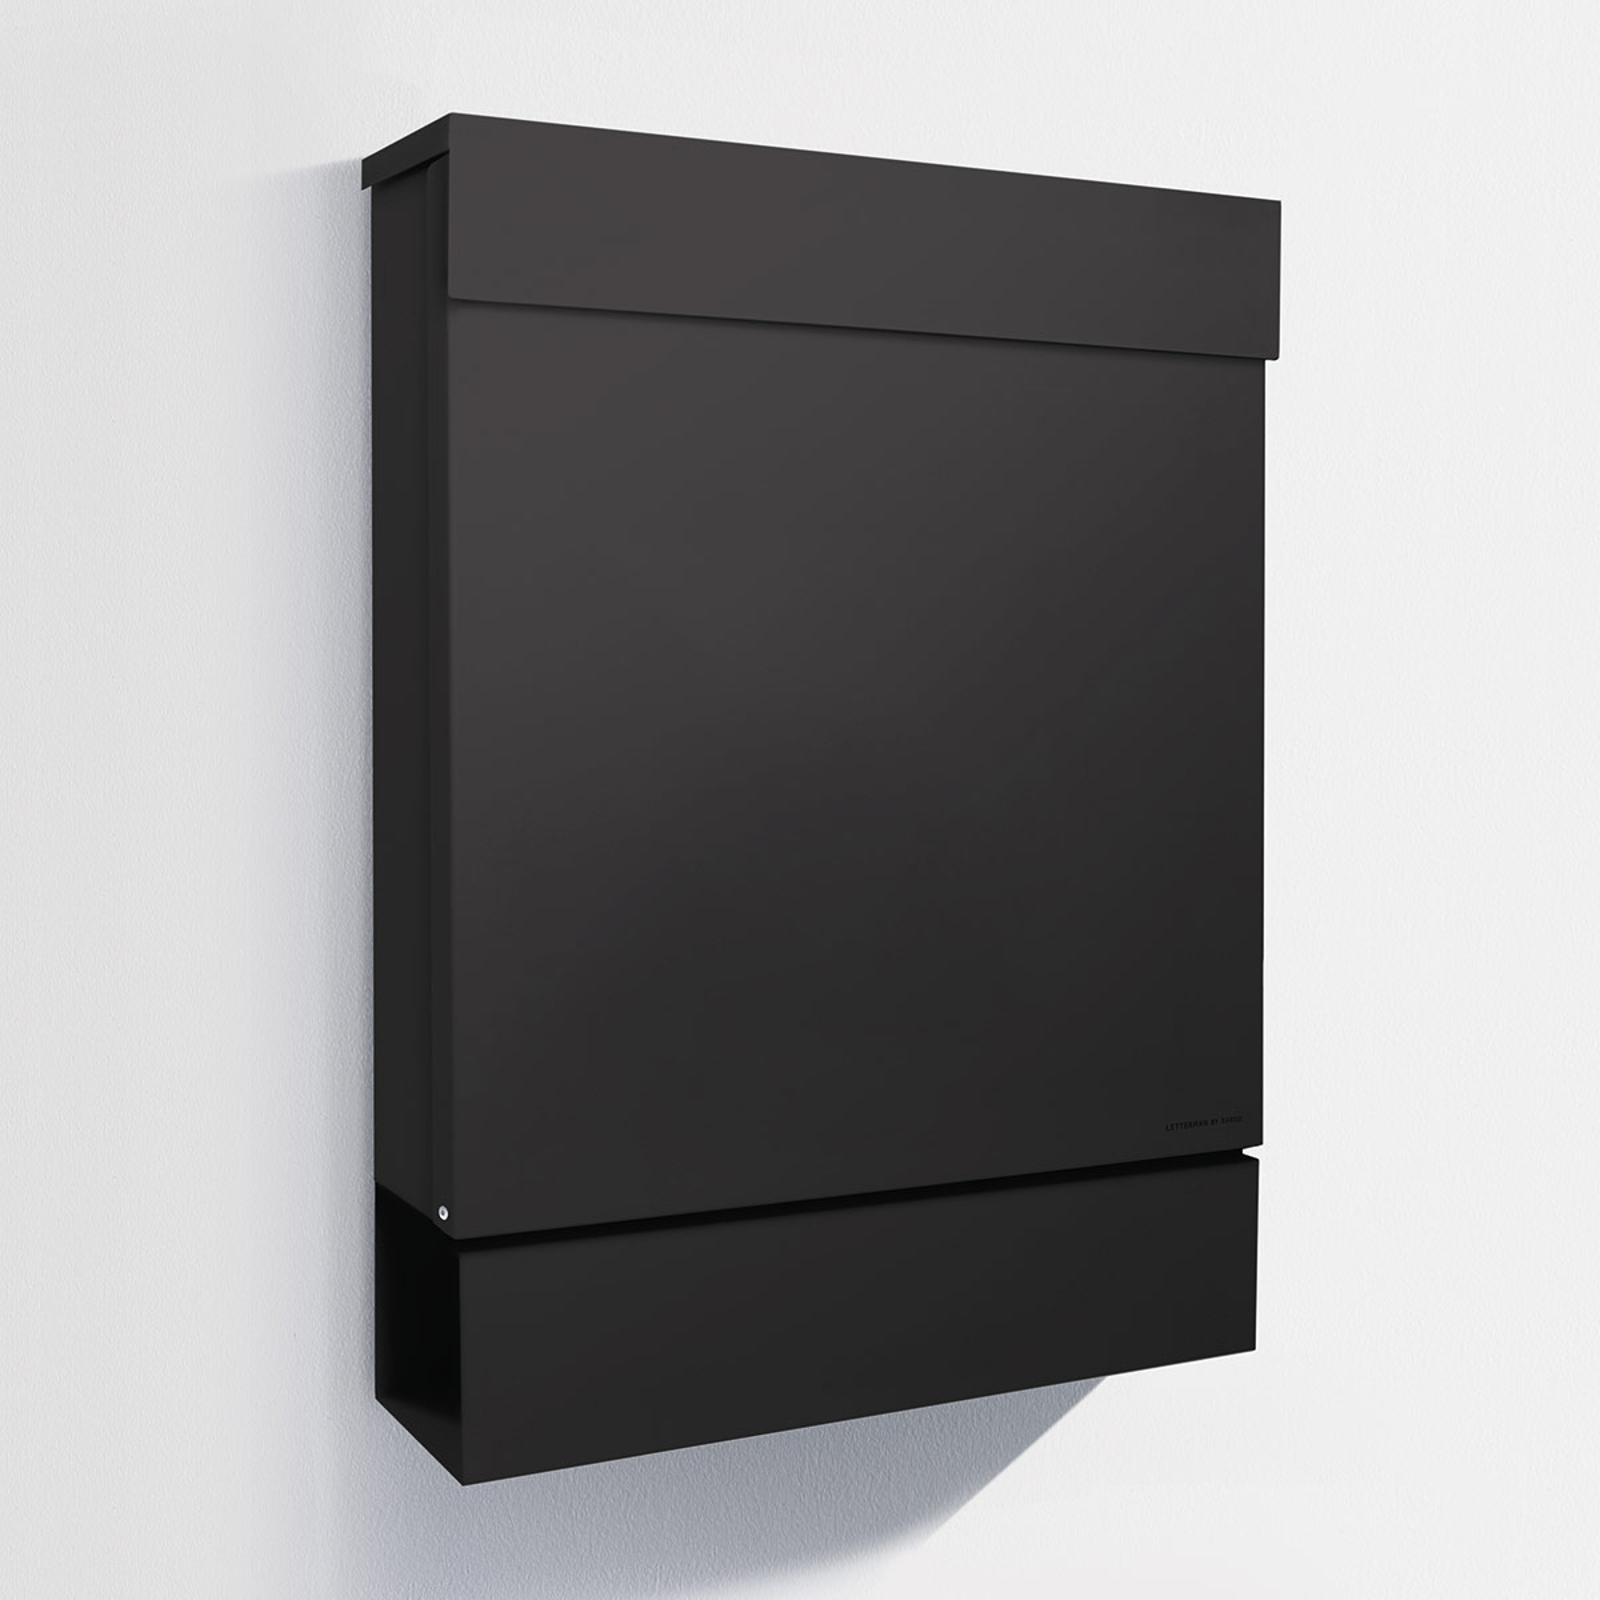 Letterman M buzón, compartimento prensa, negro